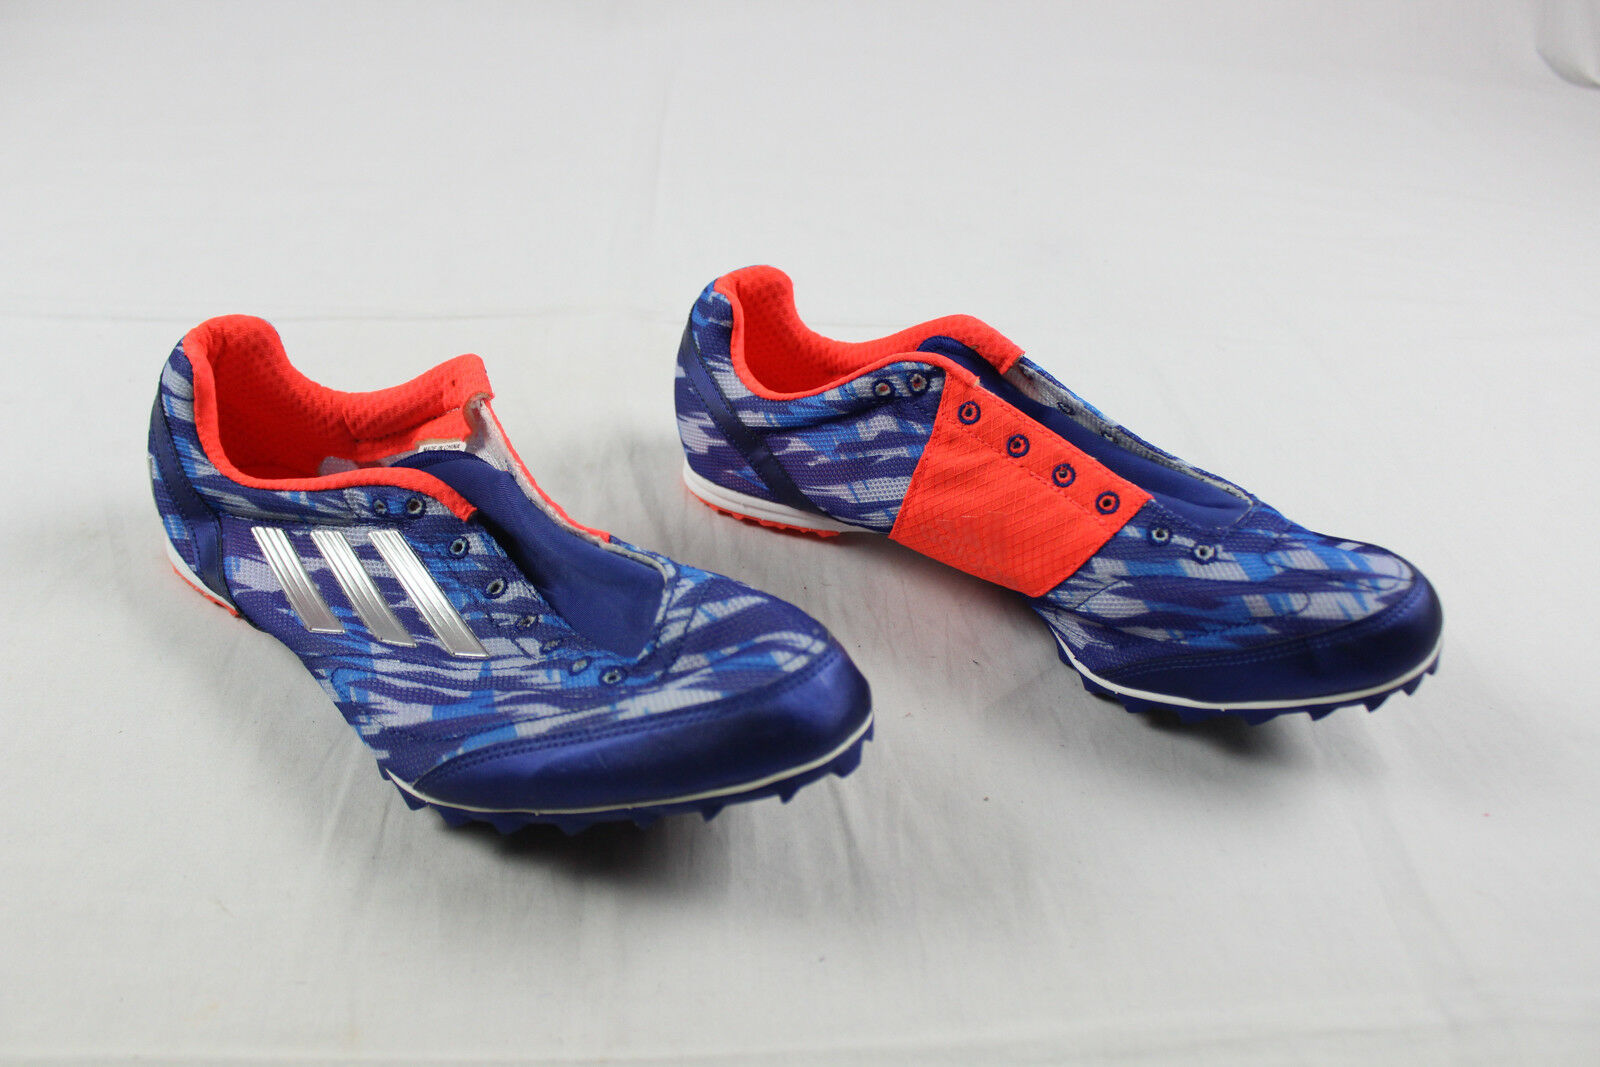 huge selection of f54bb 2d5da adidas adidas adidas - Blue Gray Running, Cross Training (Men s 11) - Used  2beb75